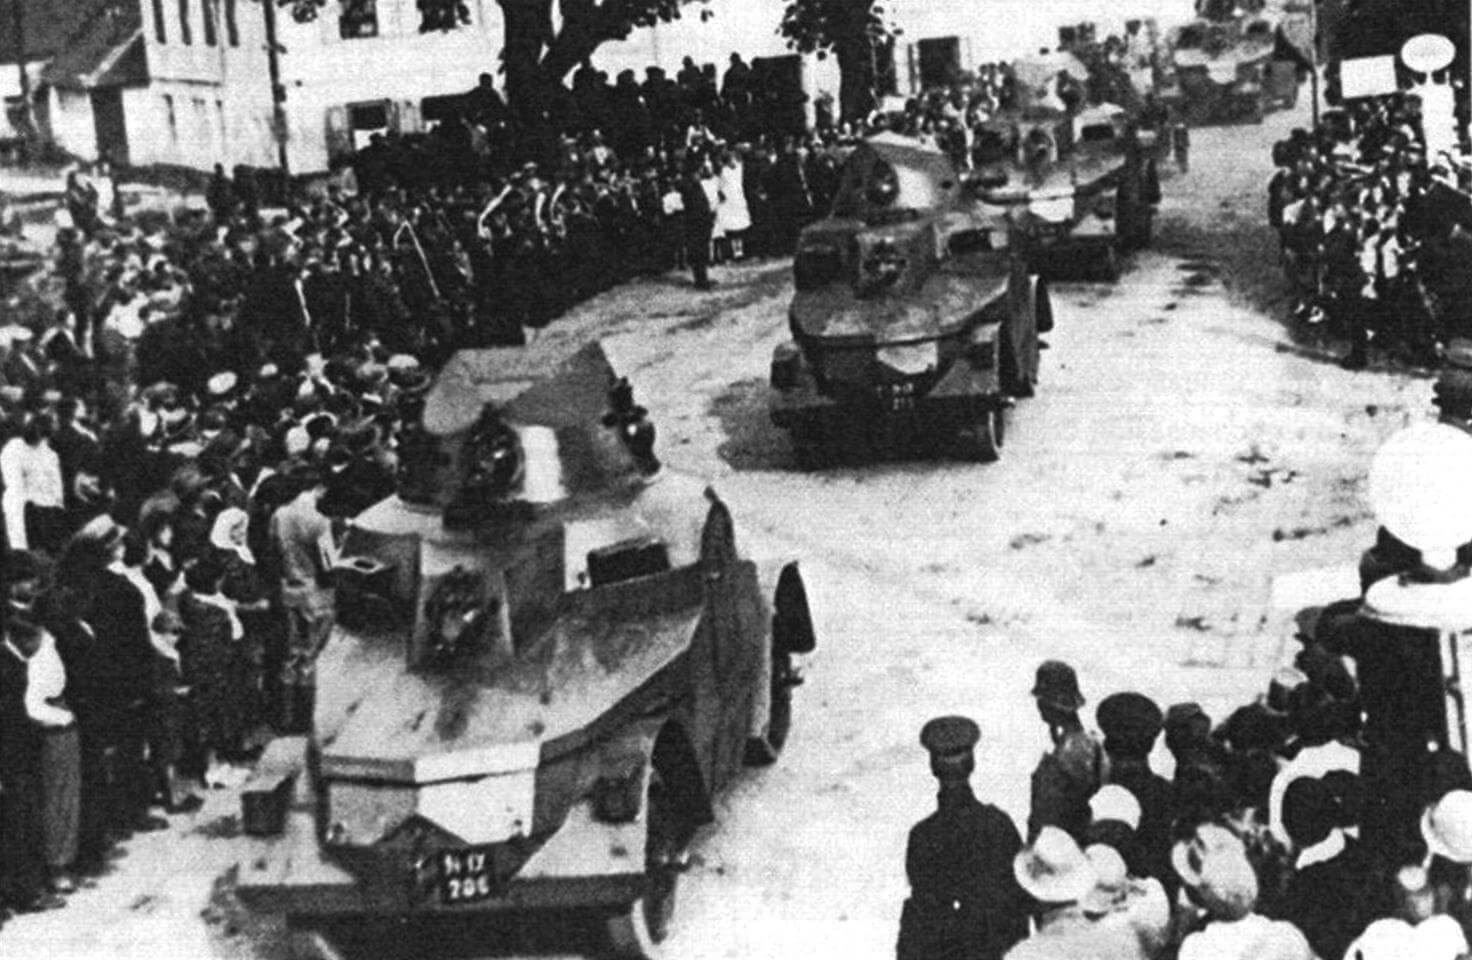 OA vz.27 на маневрах чехословацкой армии